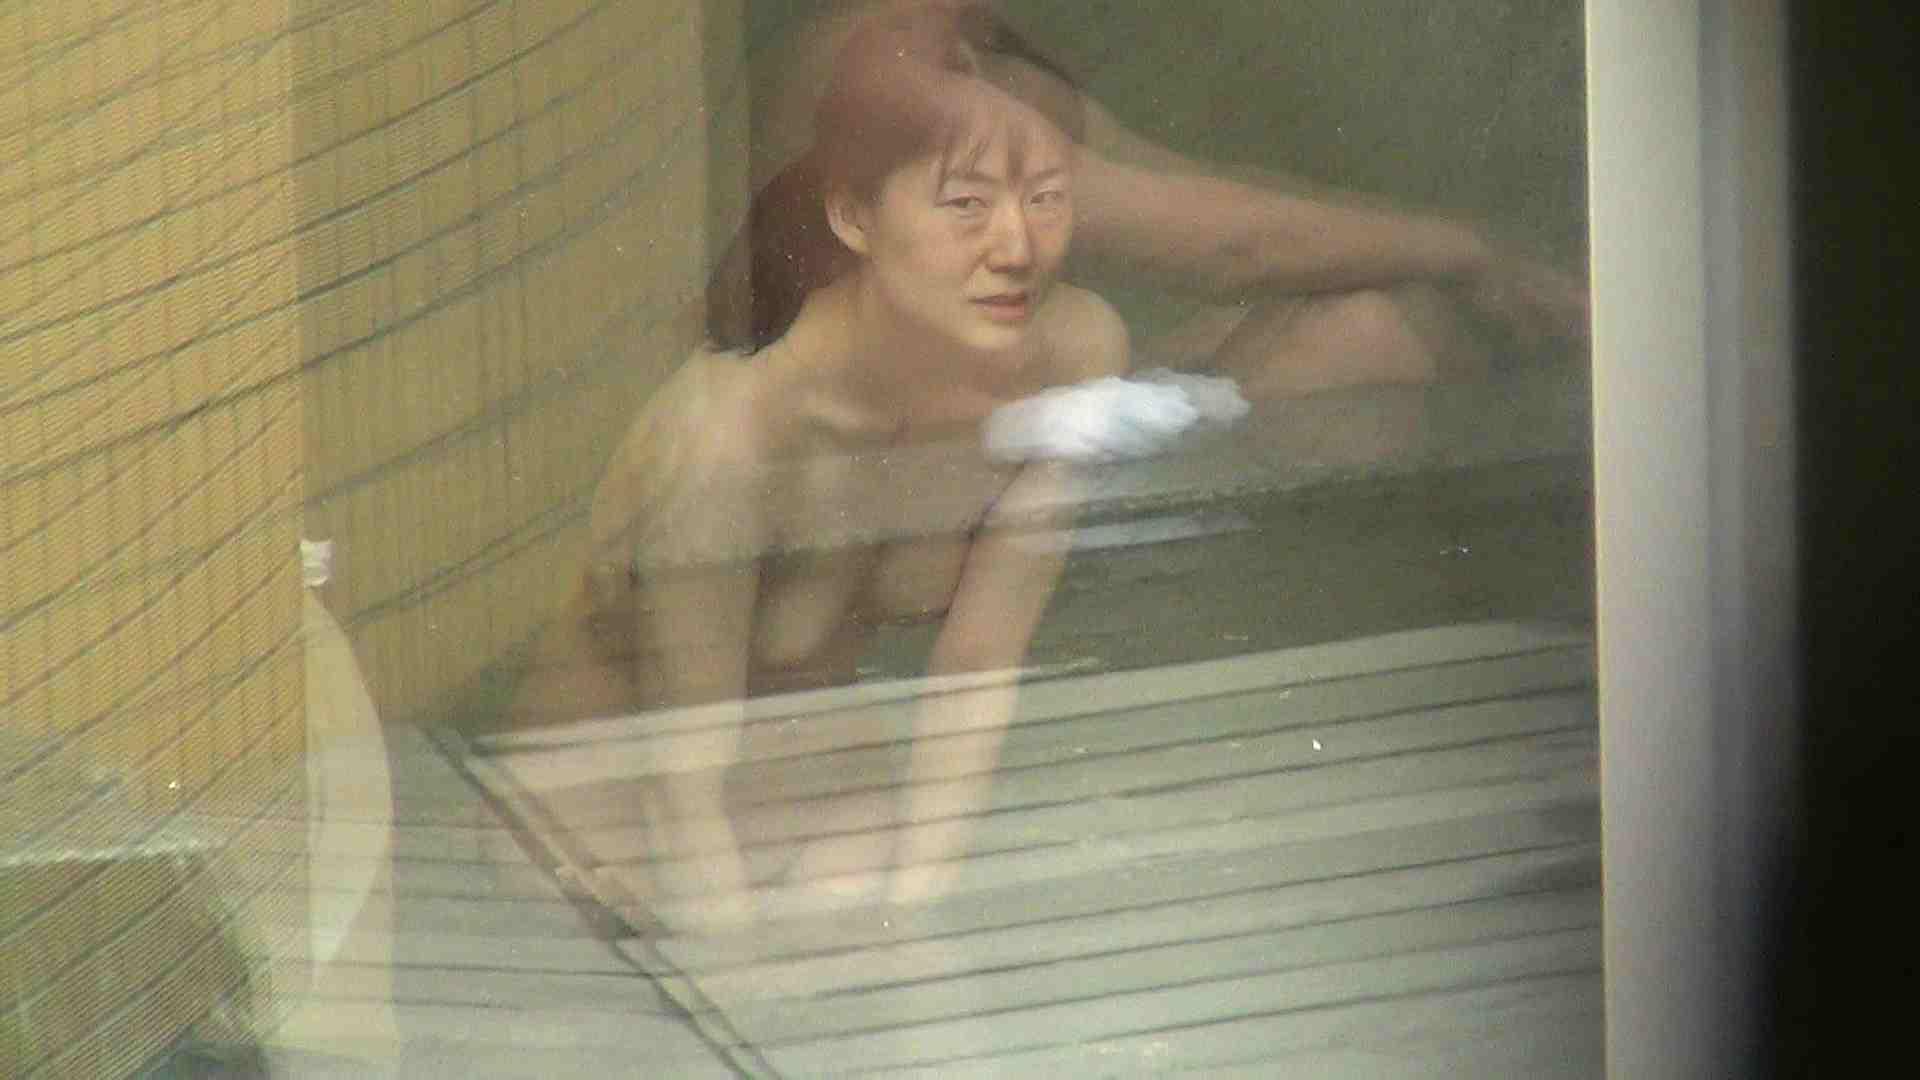 Aquaな露天風呂Vol.299 HなOL | 露天  80pic 56